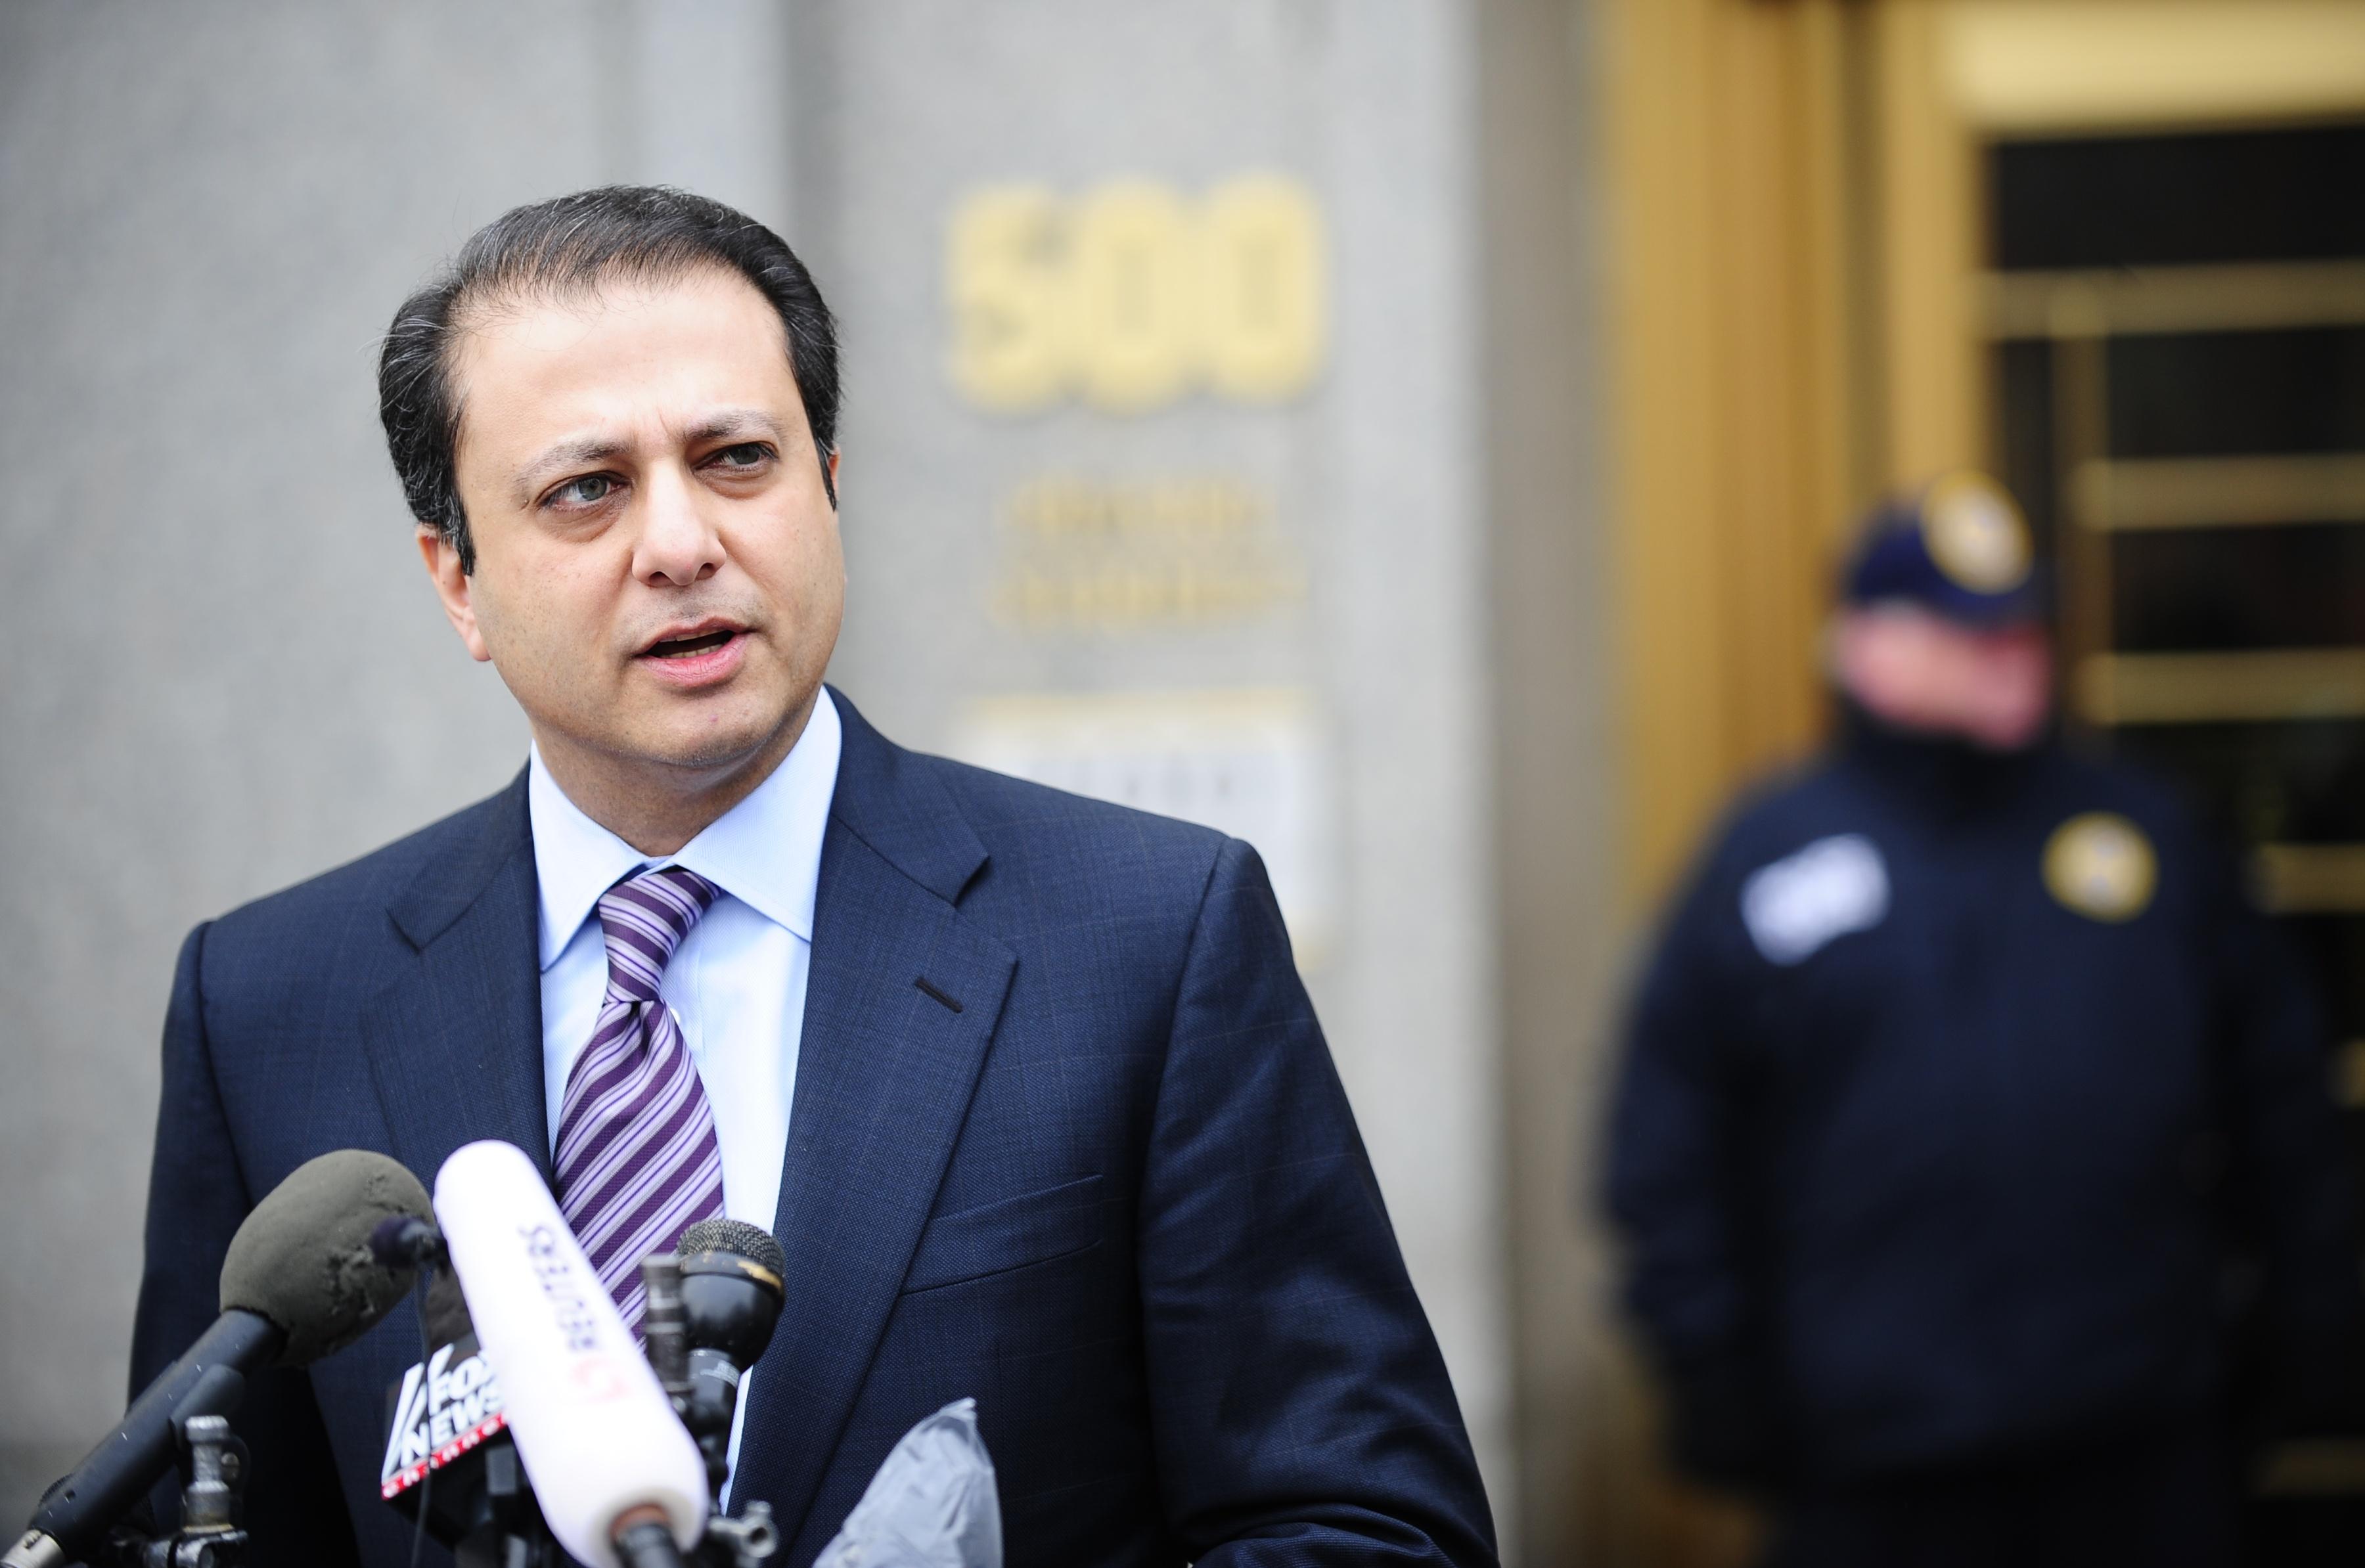 U.S. Attorney Preet Bharara. (Getty Images)